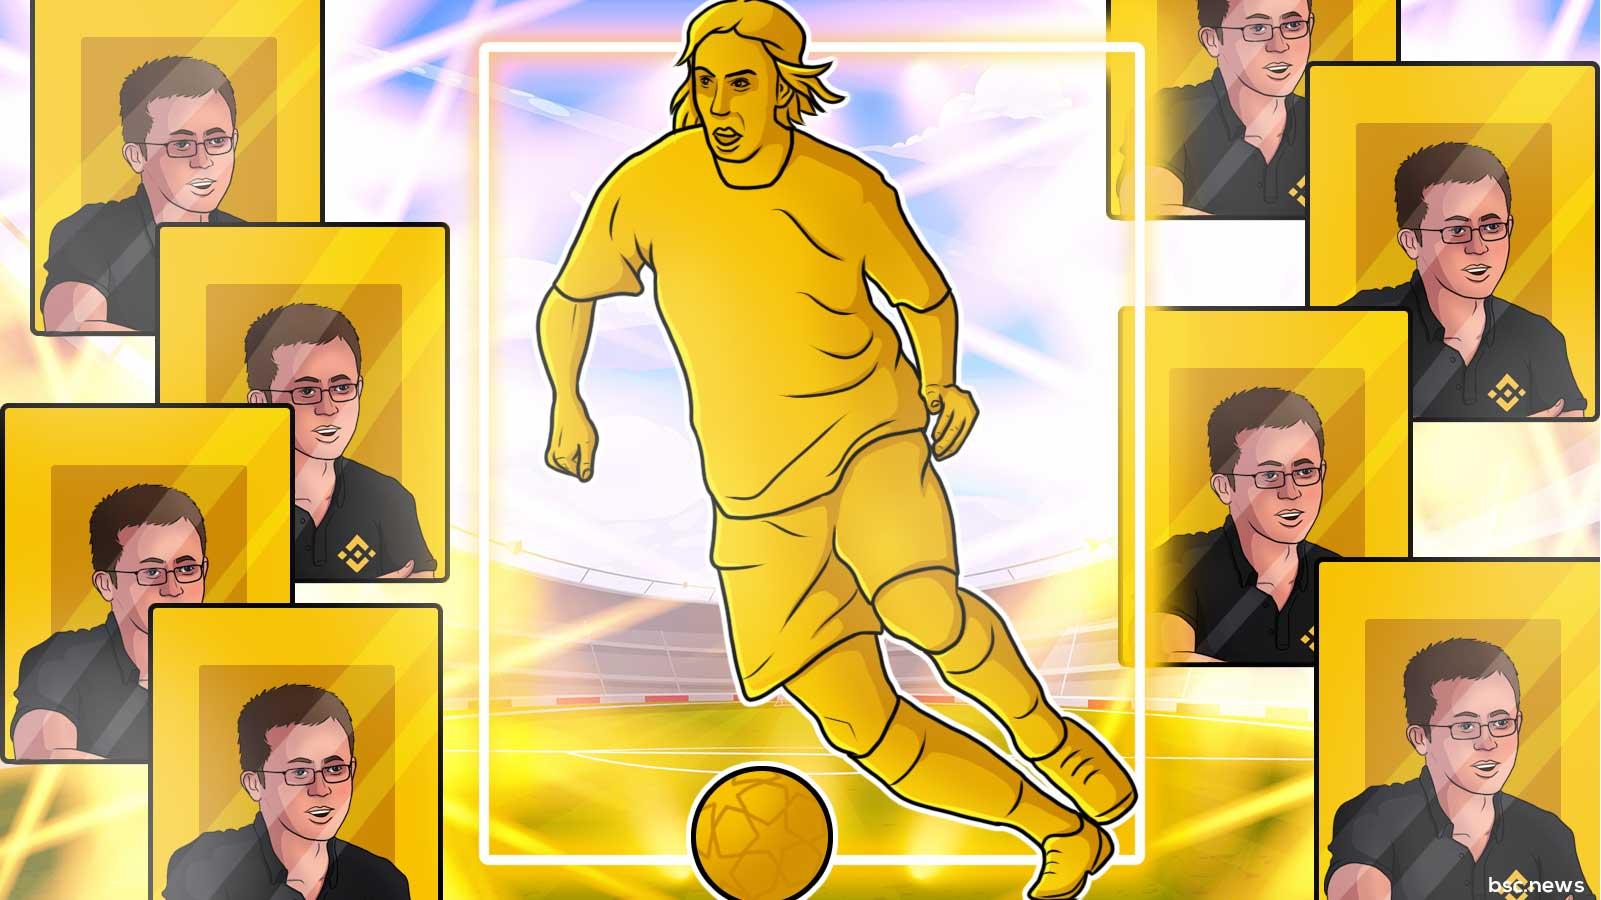 Ex-Real Madrid Player, Guti, Set for Binance NFT Listing, CZ Approves?